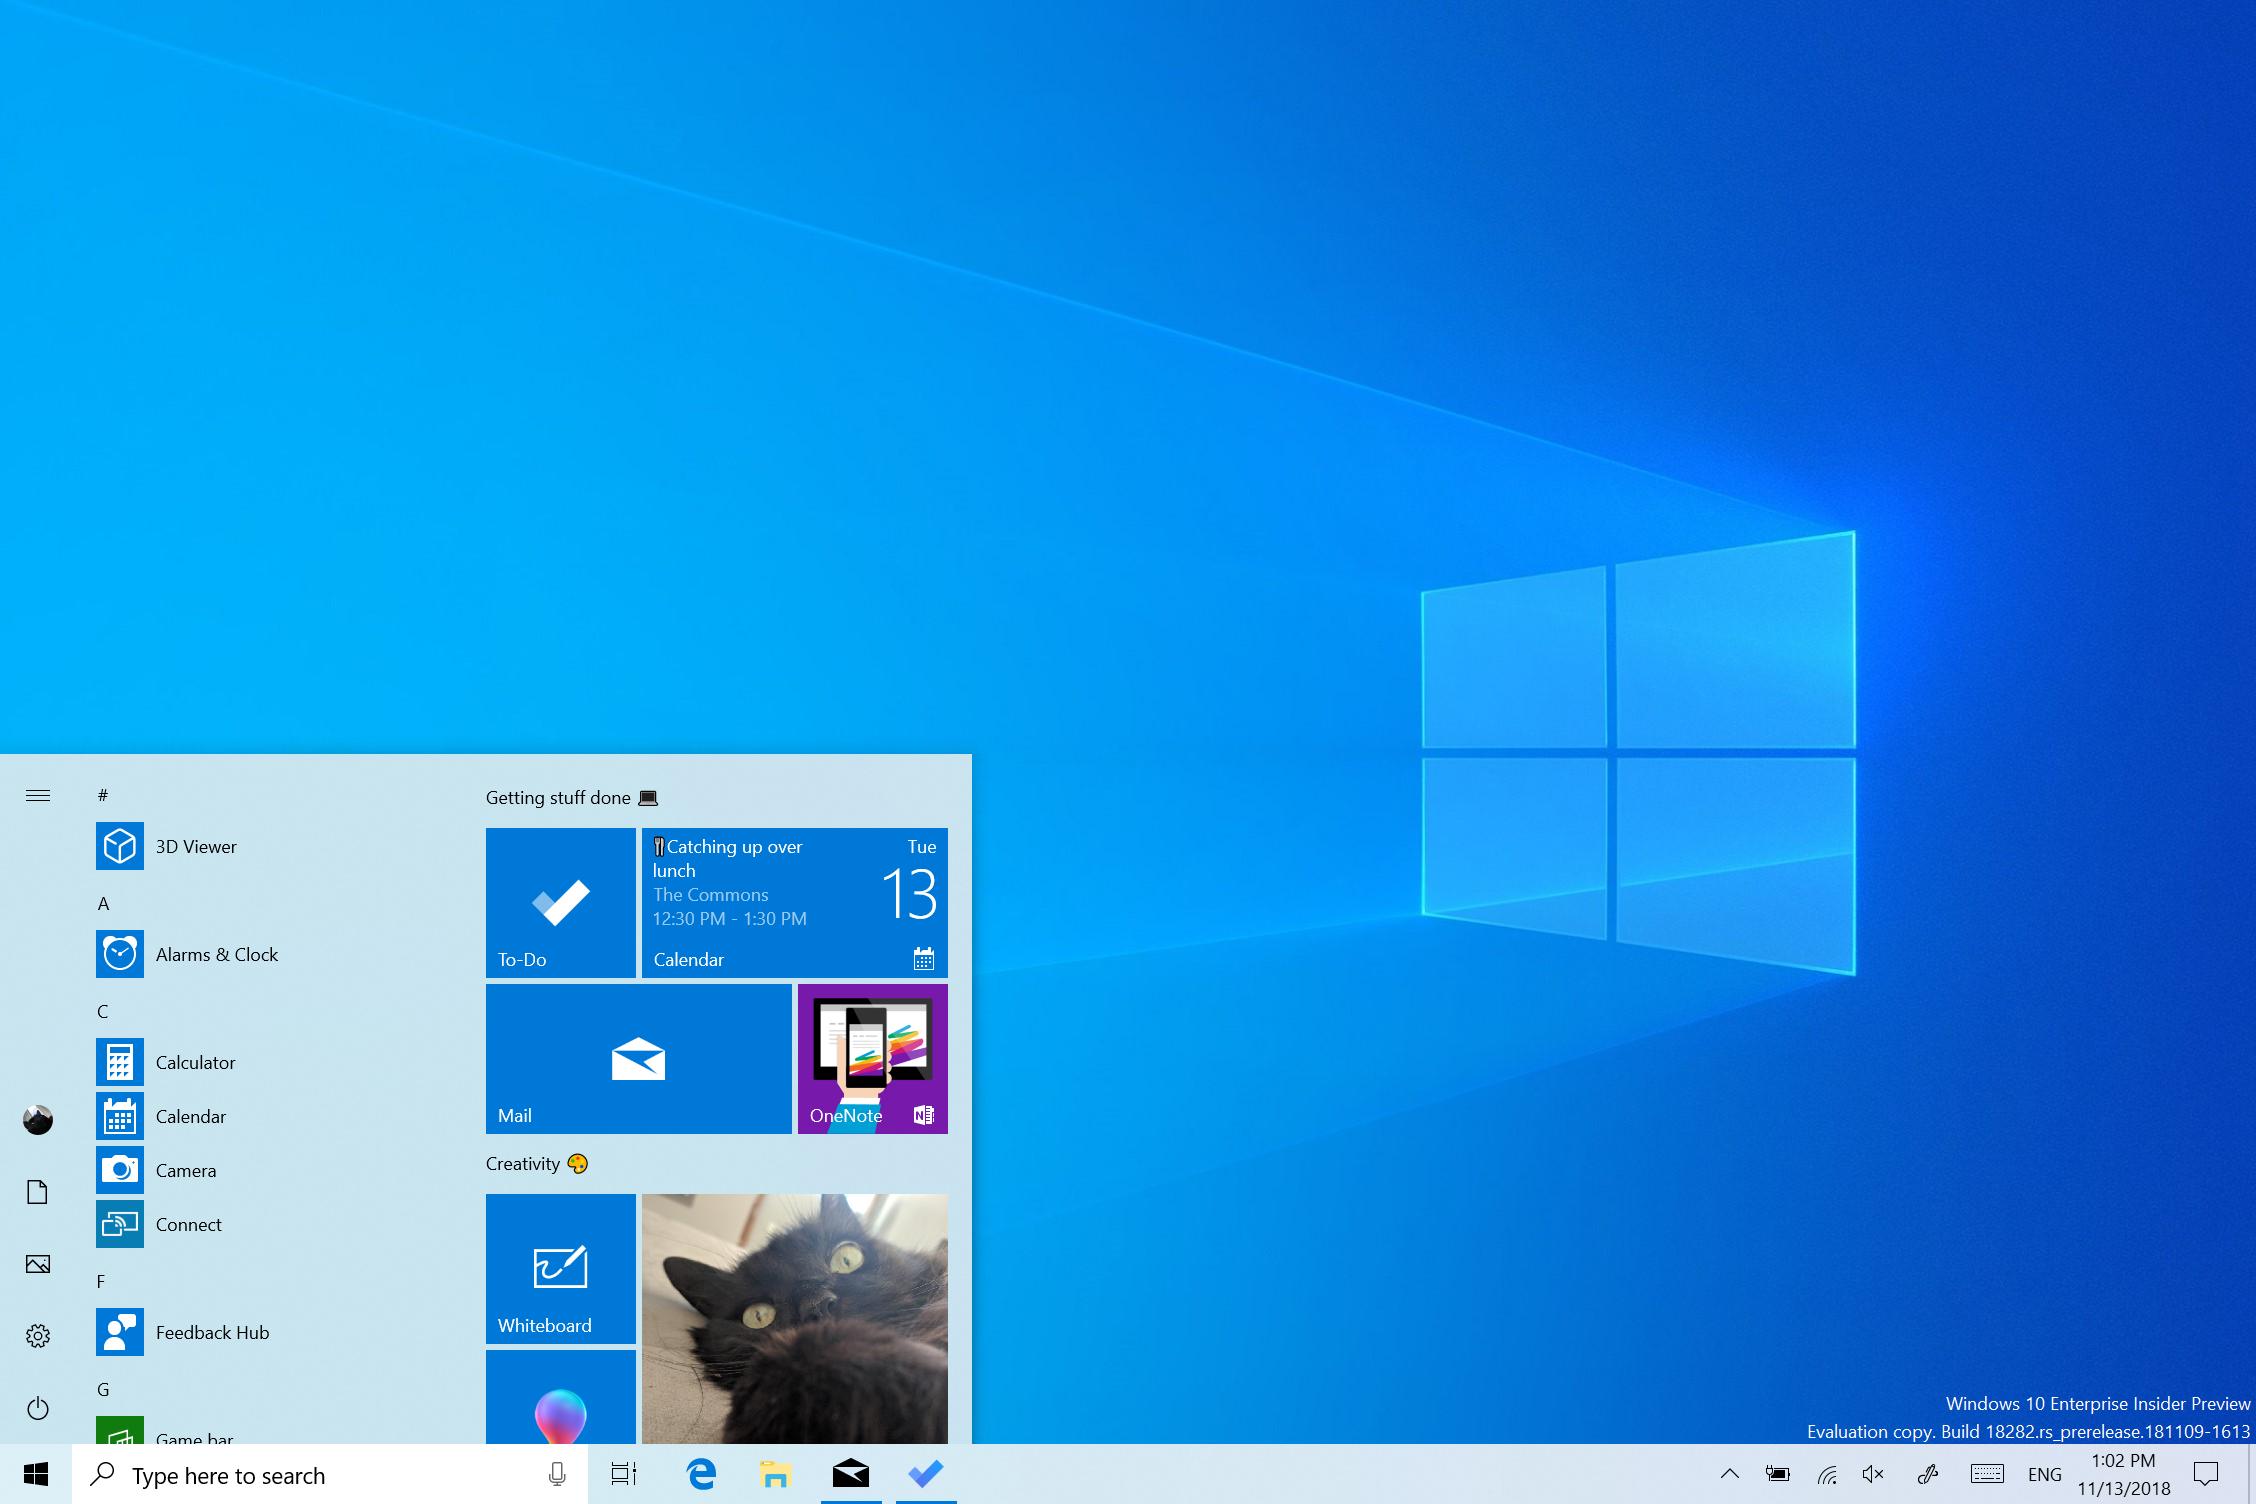 Download Windows 10 Pro 19H1 X64 September 2019 Download